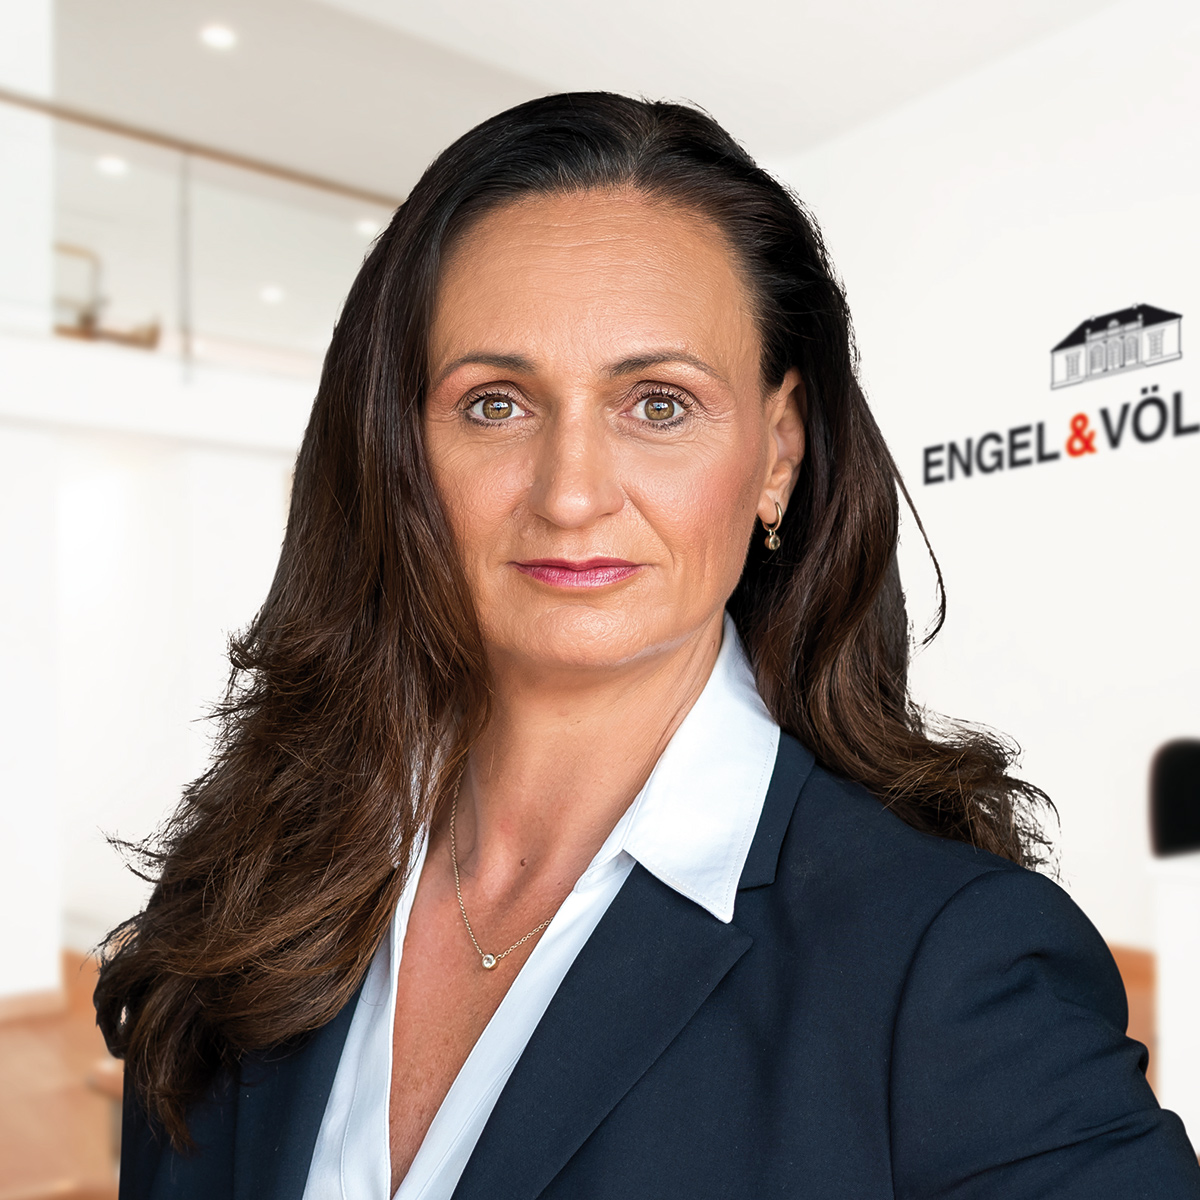 Engel & Völkers Real Estate Santa Maria